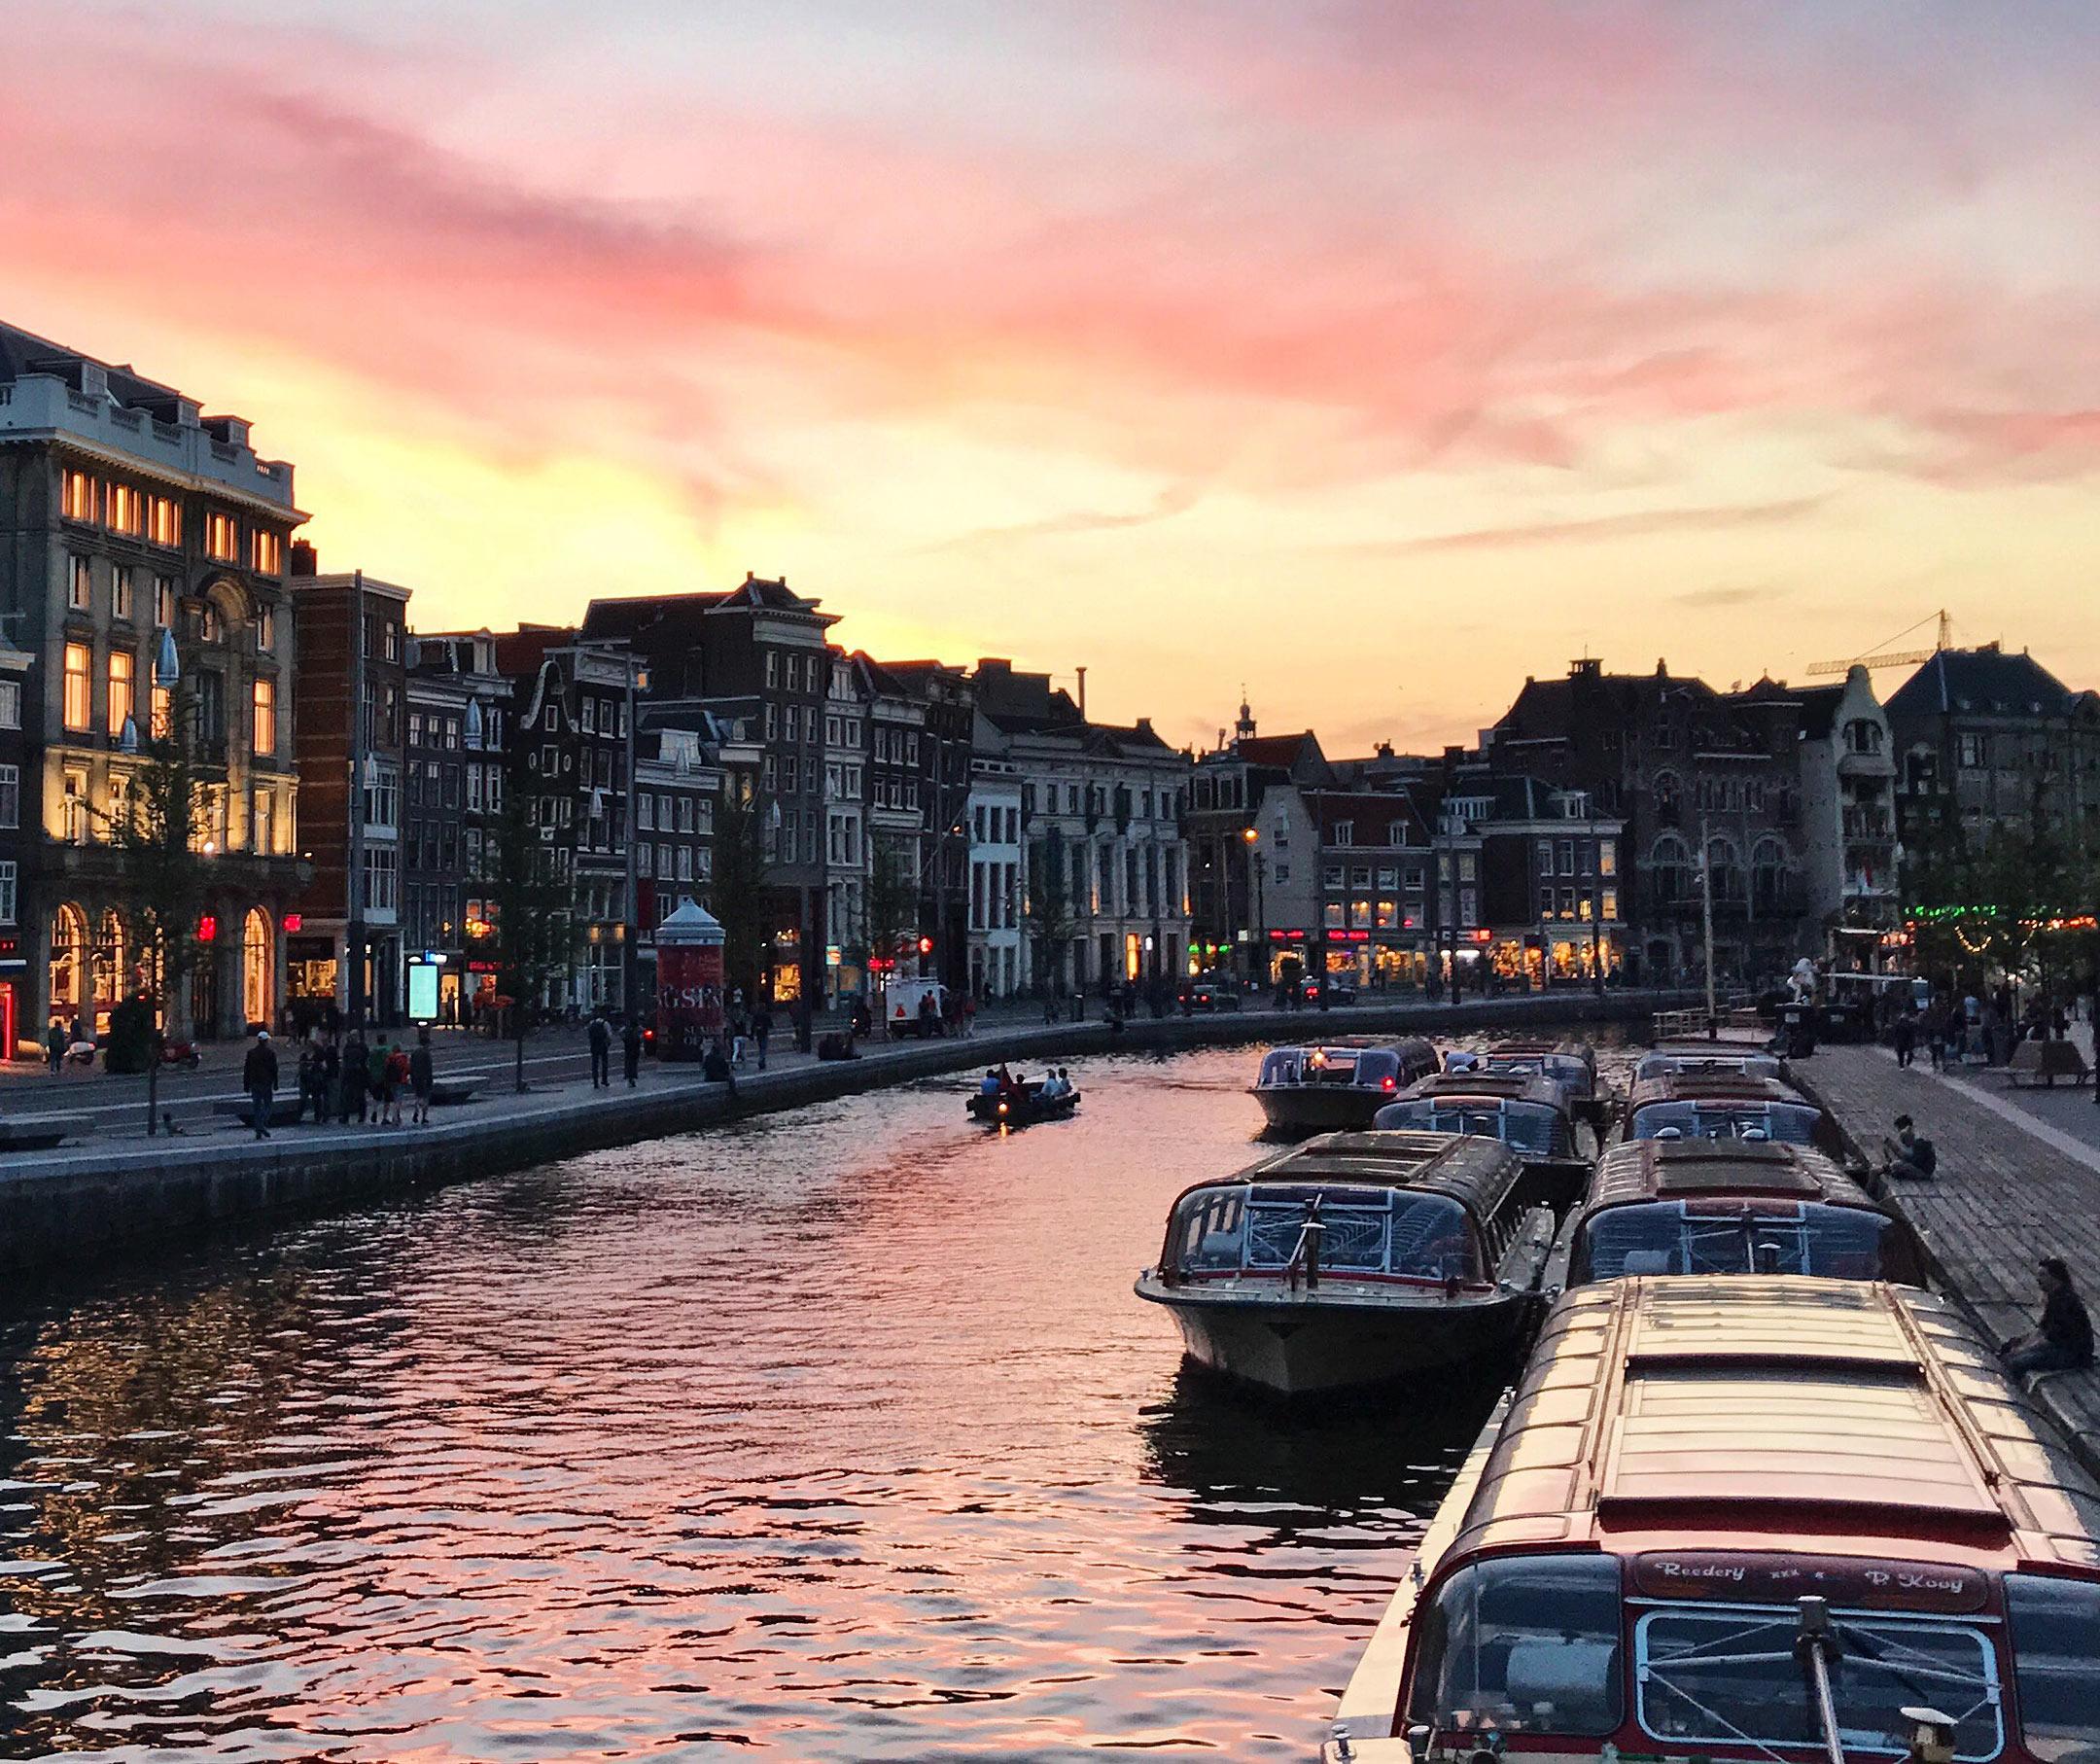 amsterdam-sundowner-nofilter-sunnyinga-lifestyle-blog